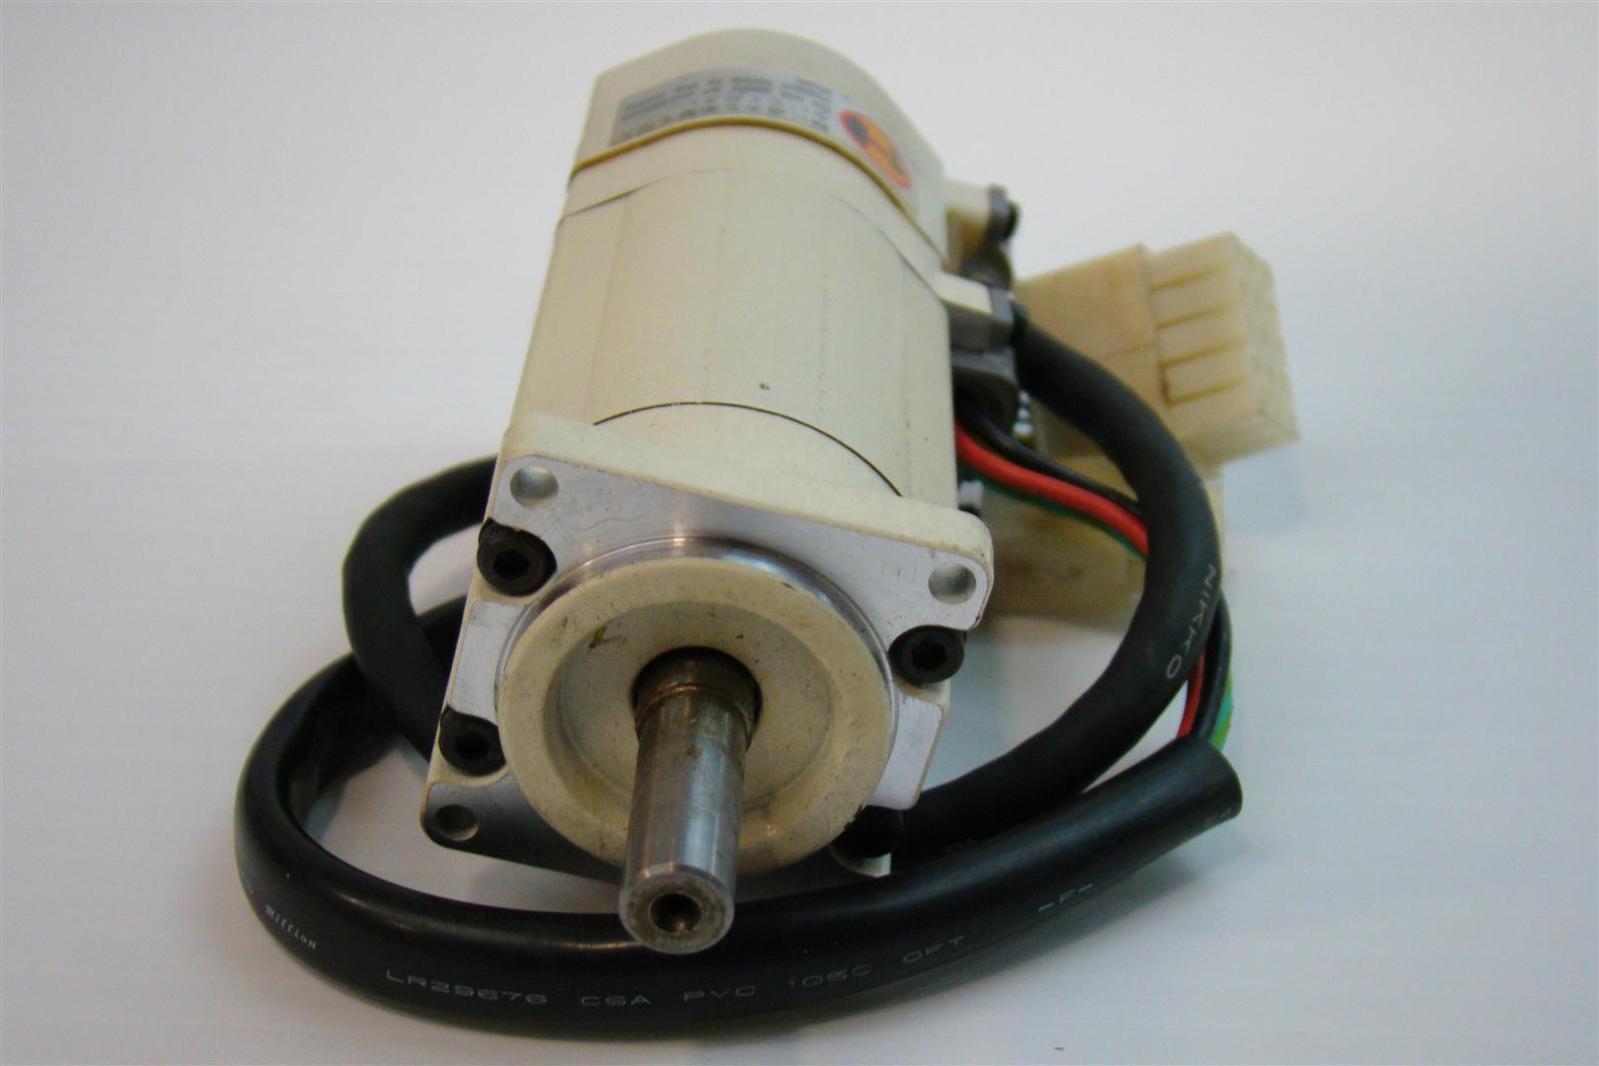 Panasonic Servo Motor 97032164 Msm012a1a Joseph Fazzio